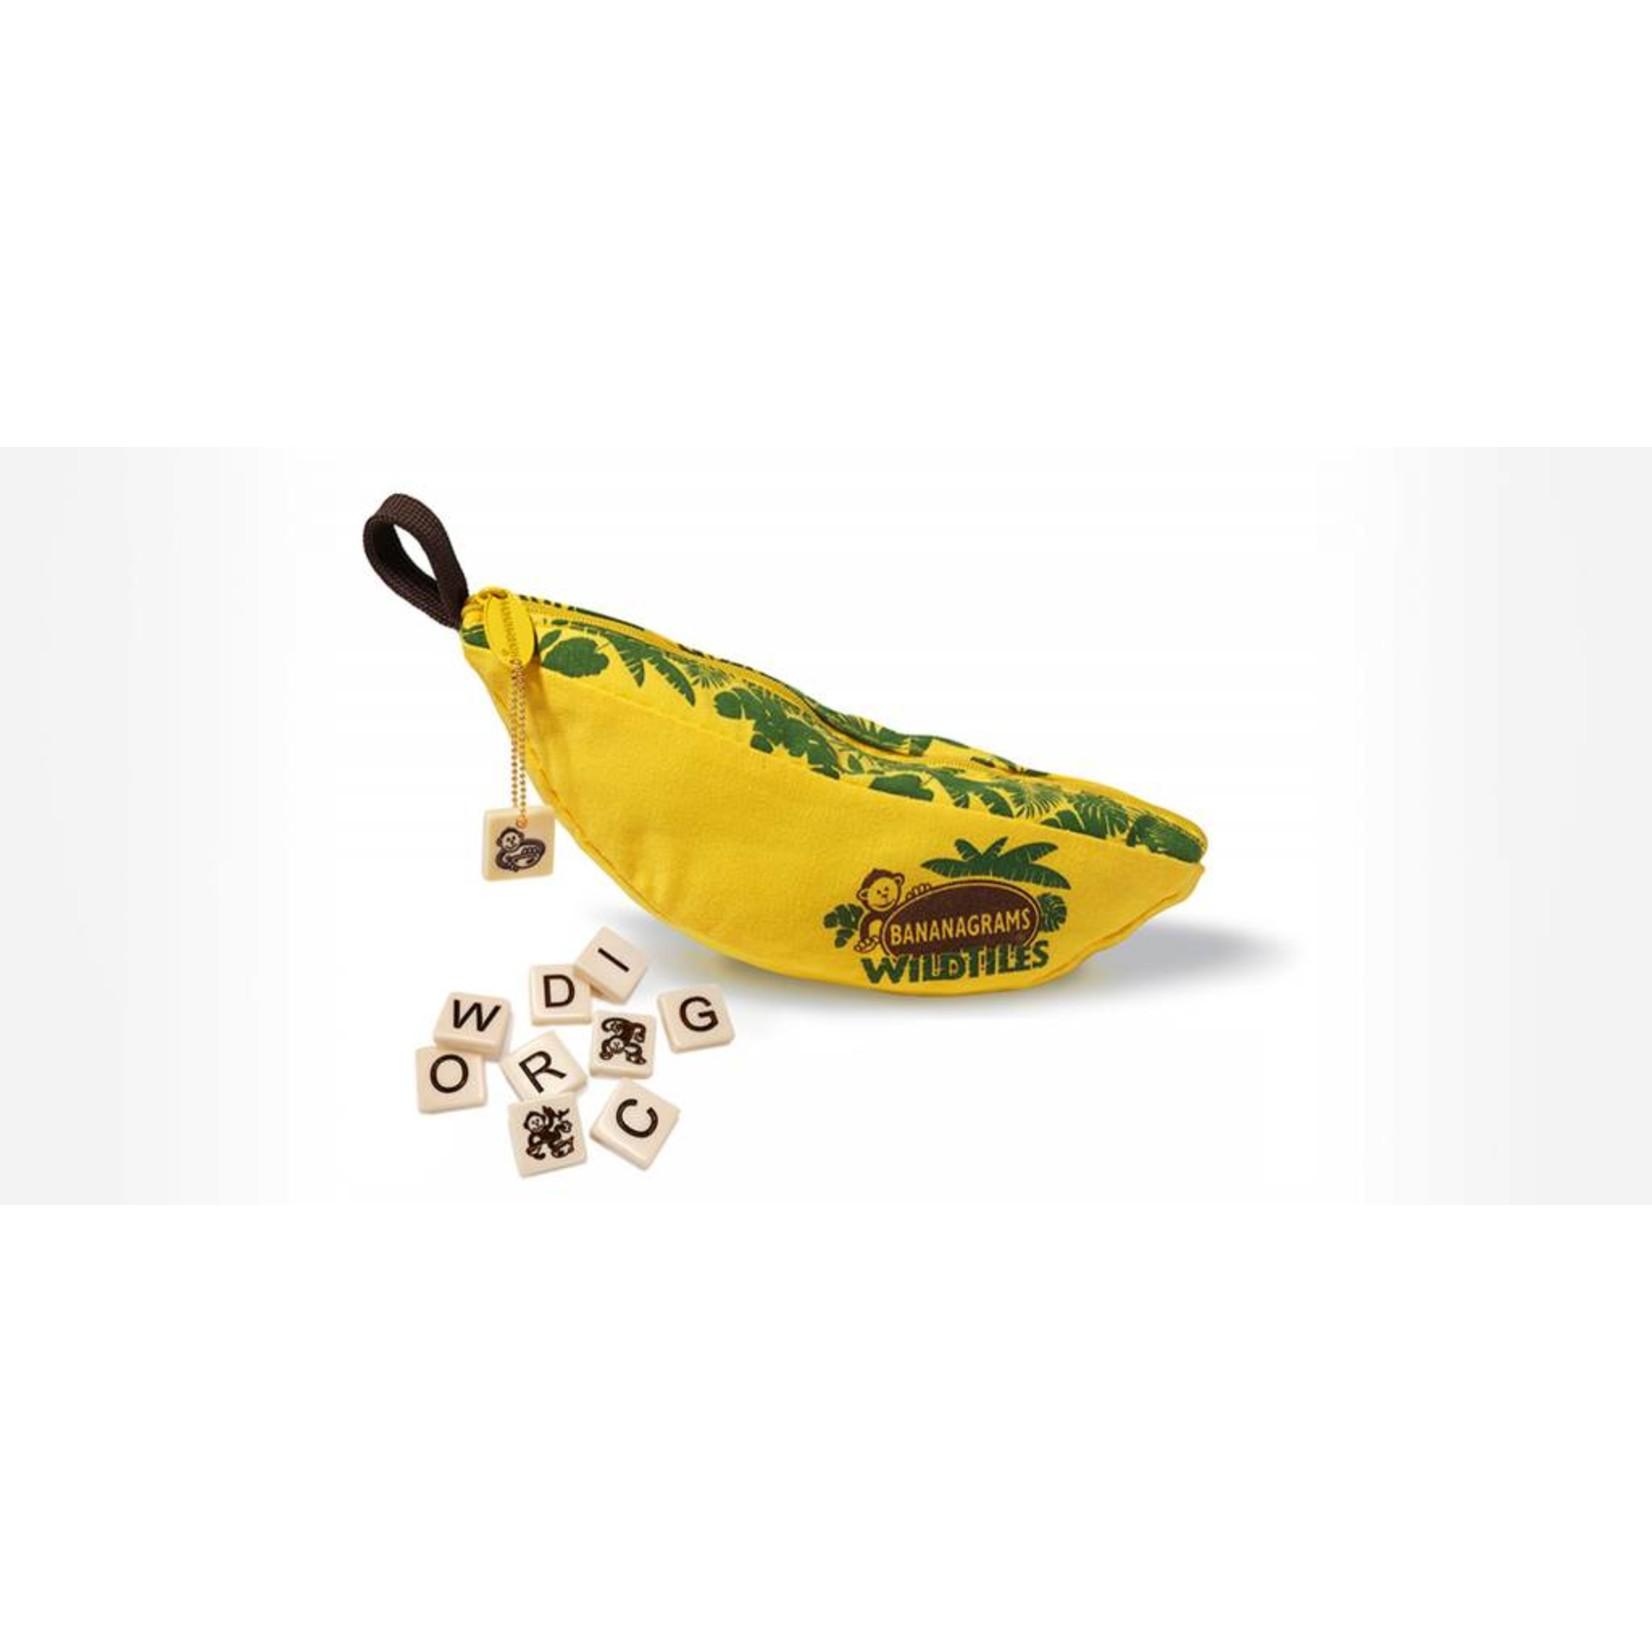 Bananagrams Bananagrams Wild Tiles